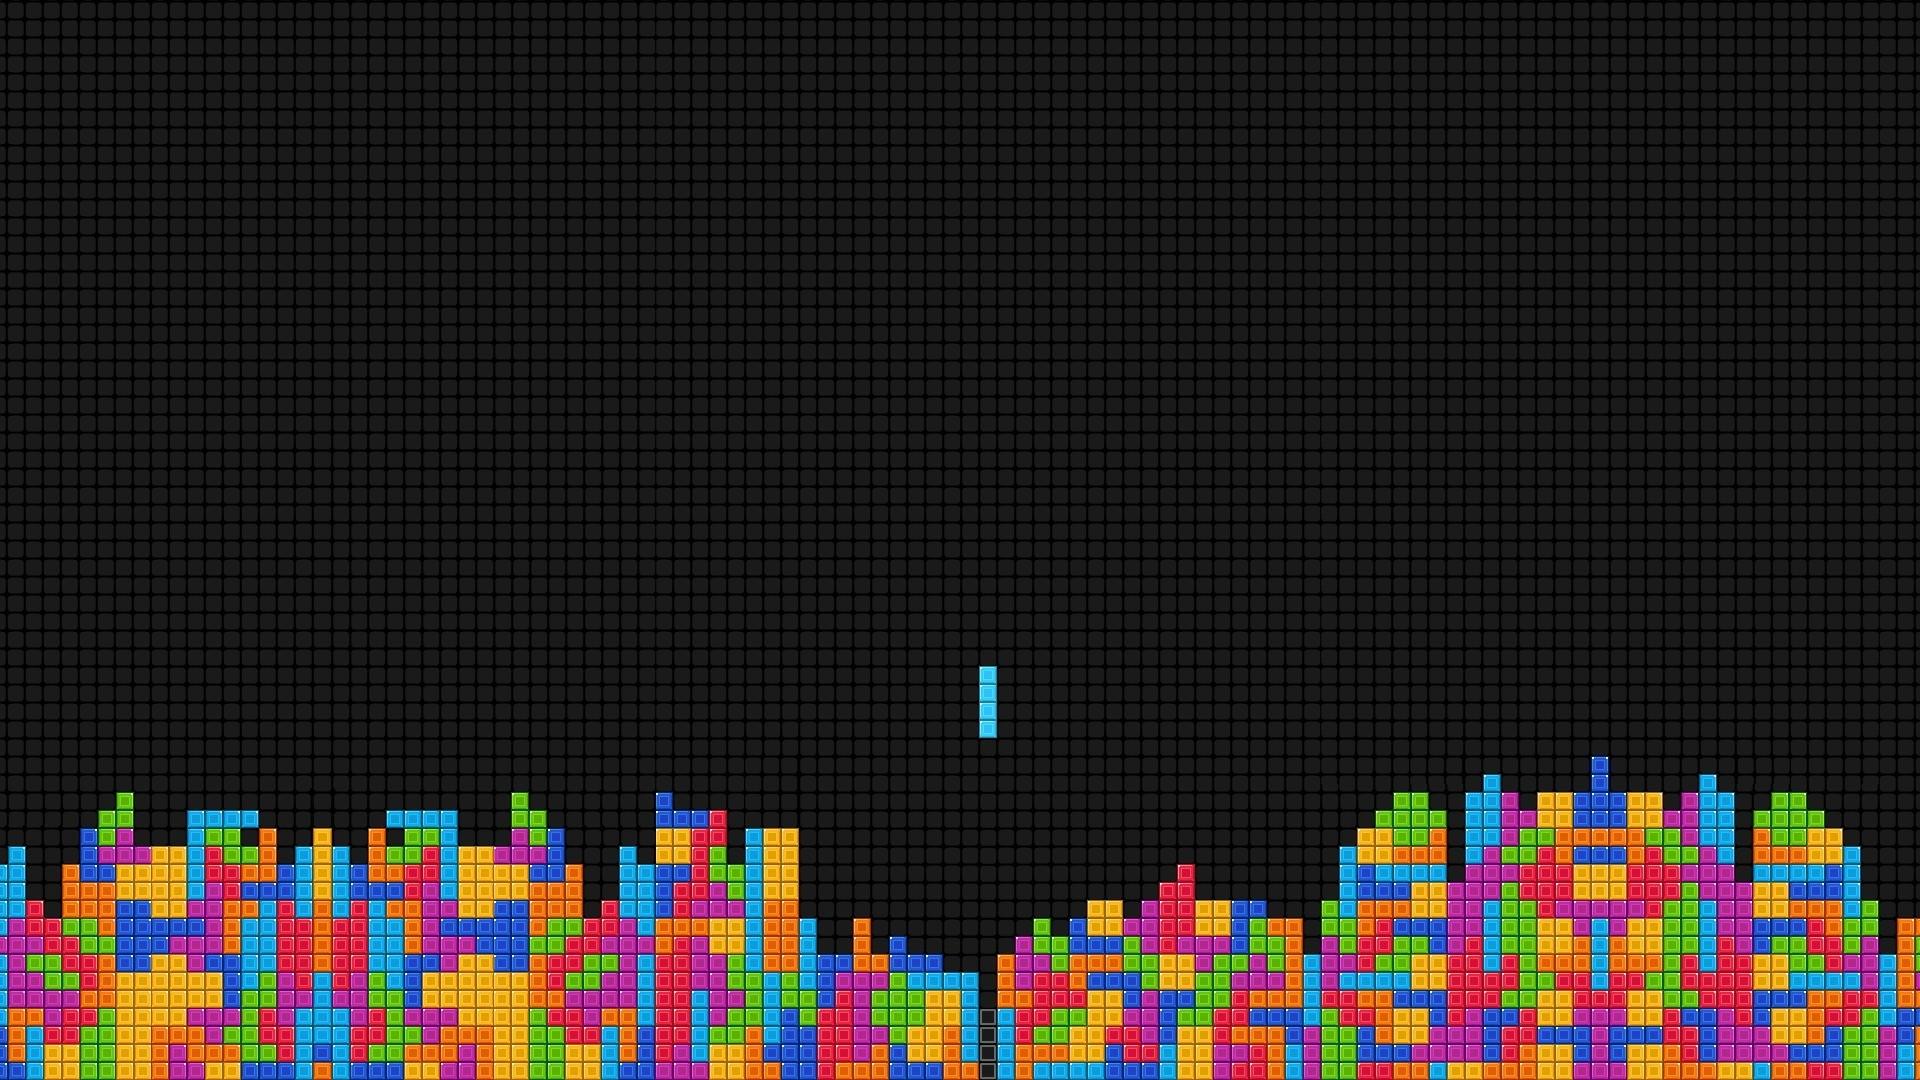 Tetris [1920x1080] wallpaper 1920x1080